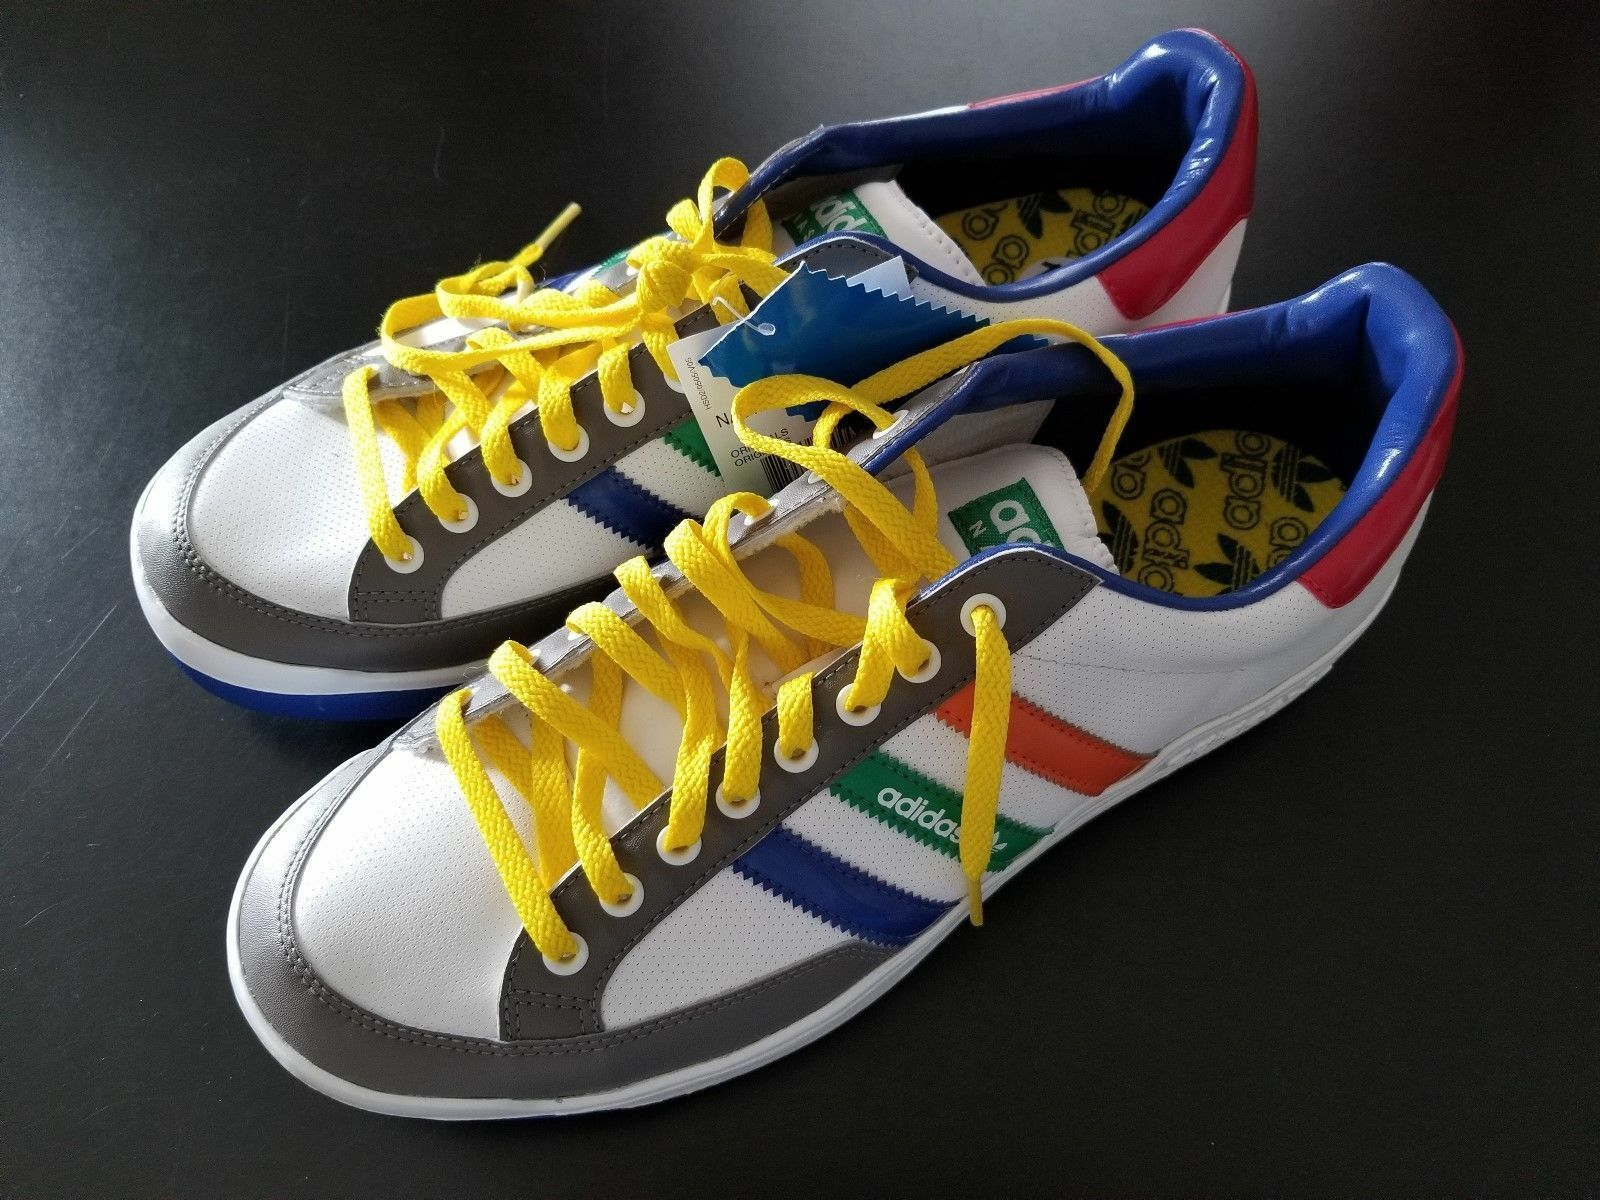 Adidas nastase yeezy cuoio originali dimensioni 12 yeezy nastase 32d184